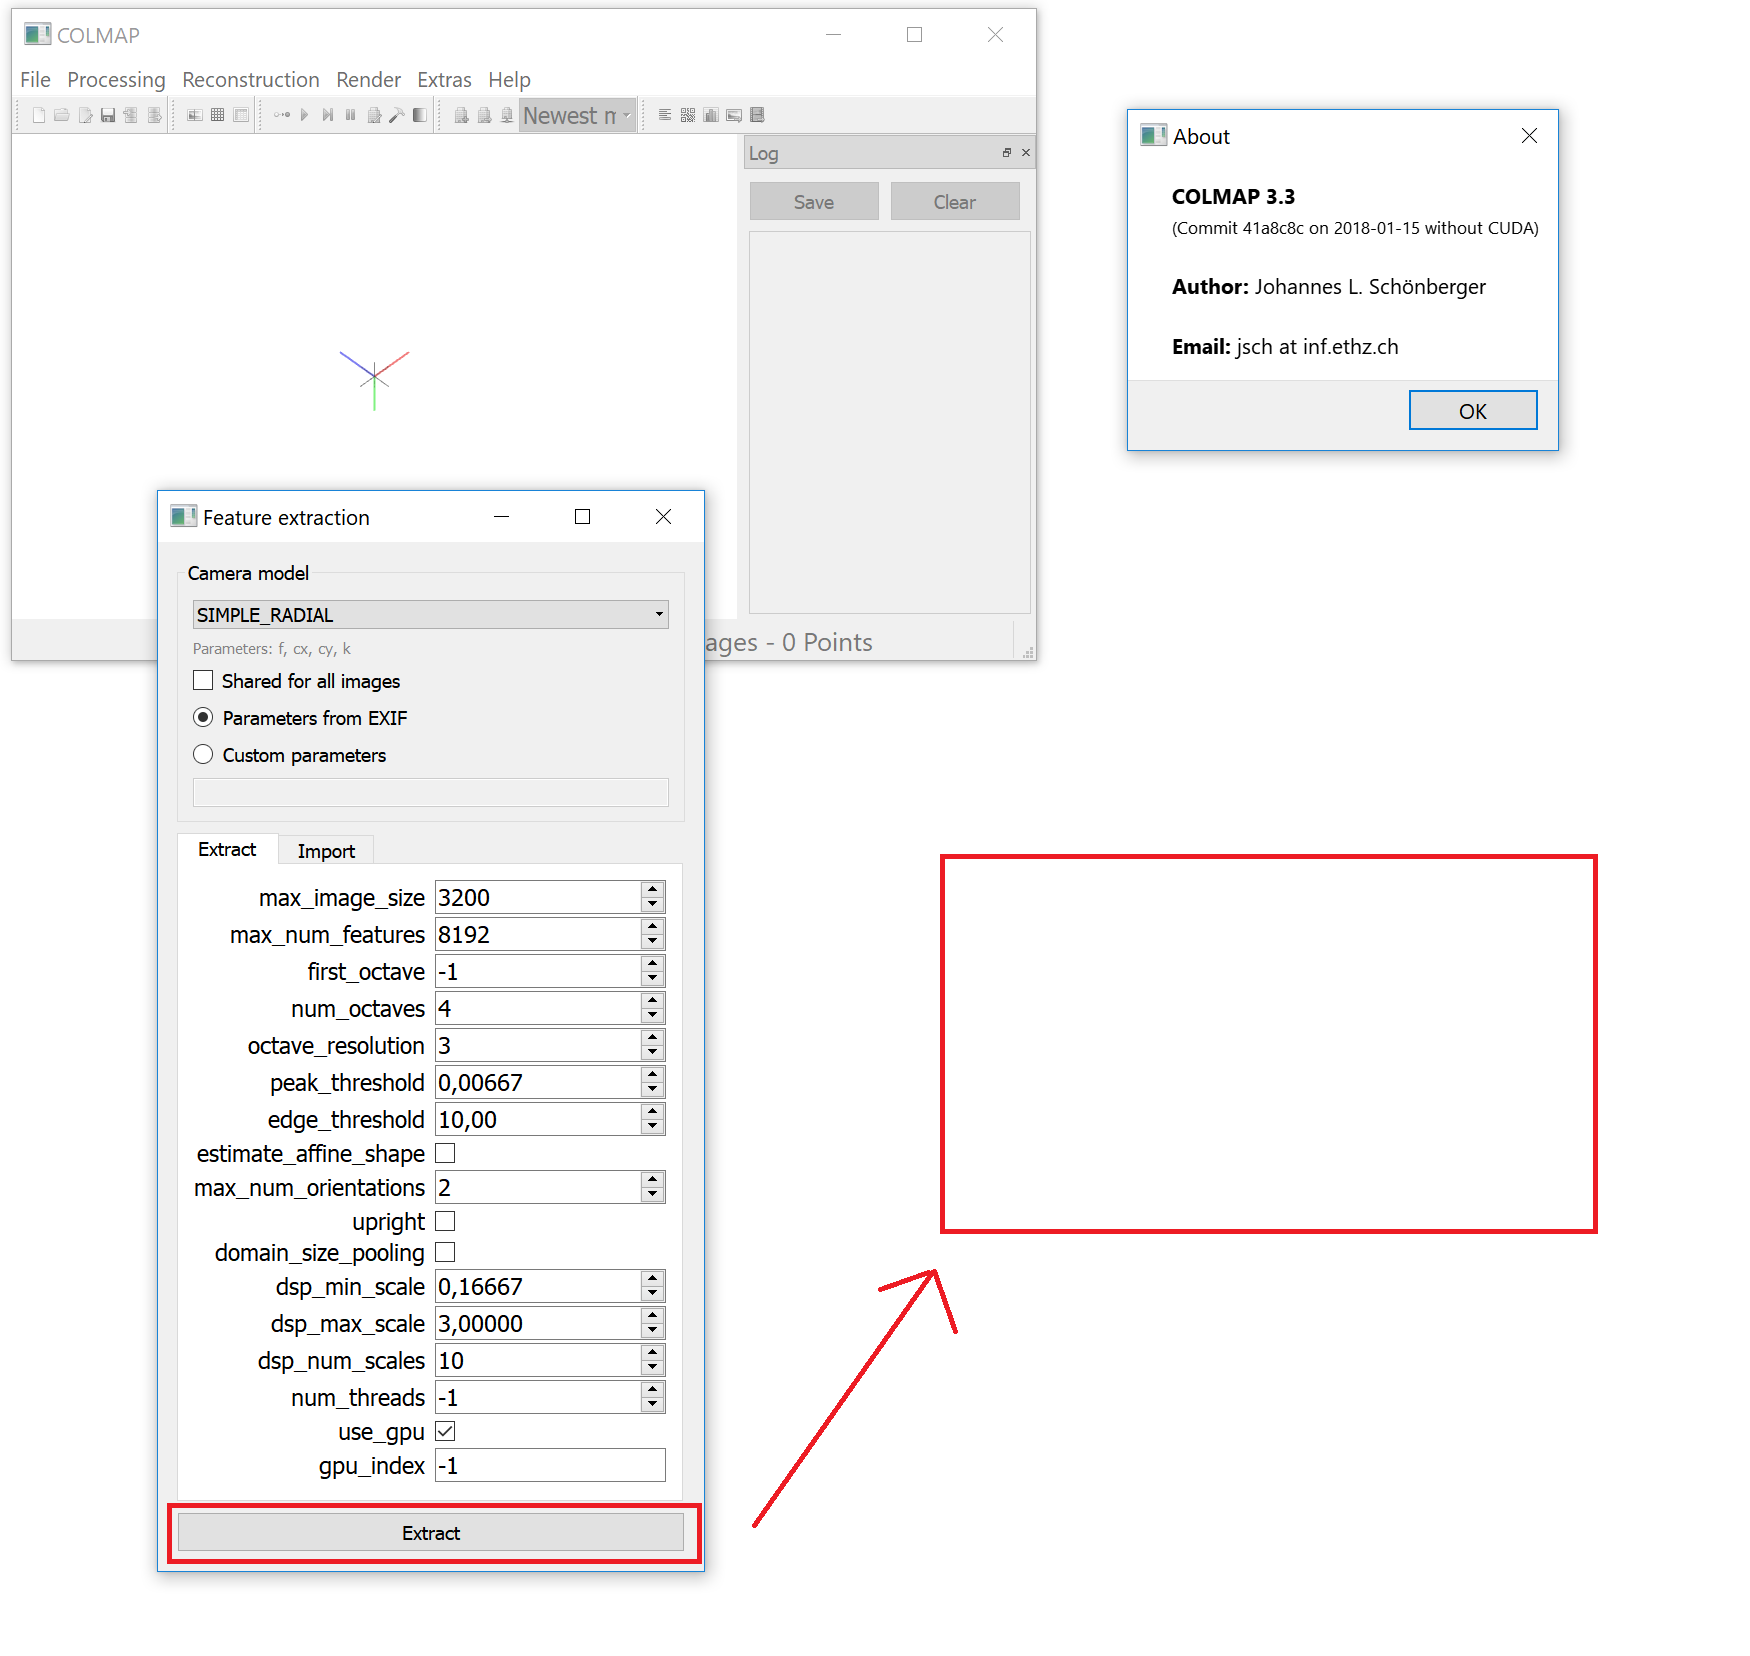 COLMAP 3 3 crash · Issue #276 · colmap/colmap · GitHub